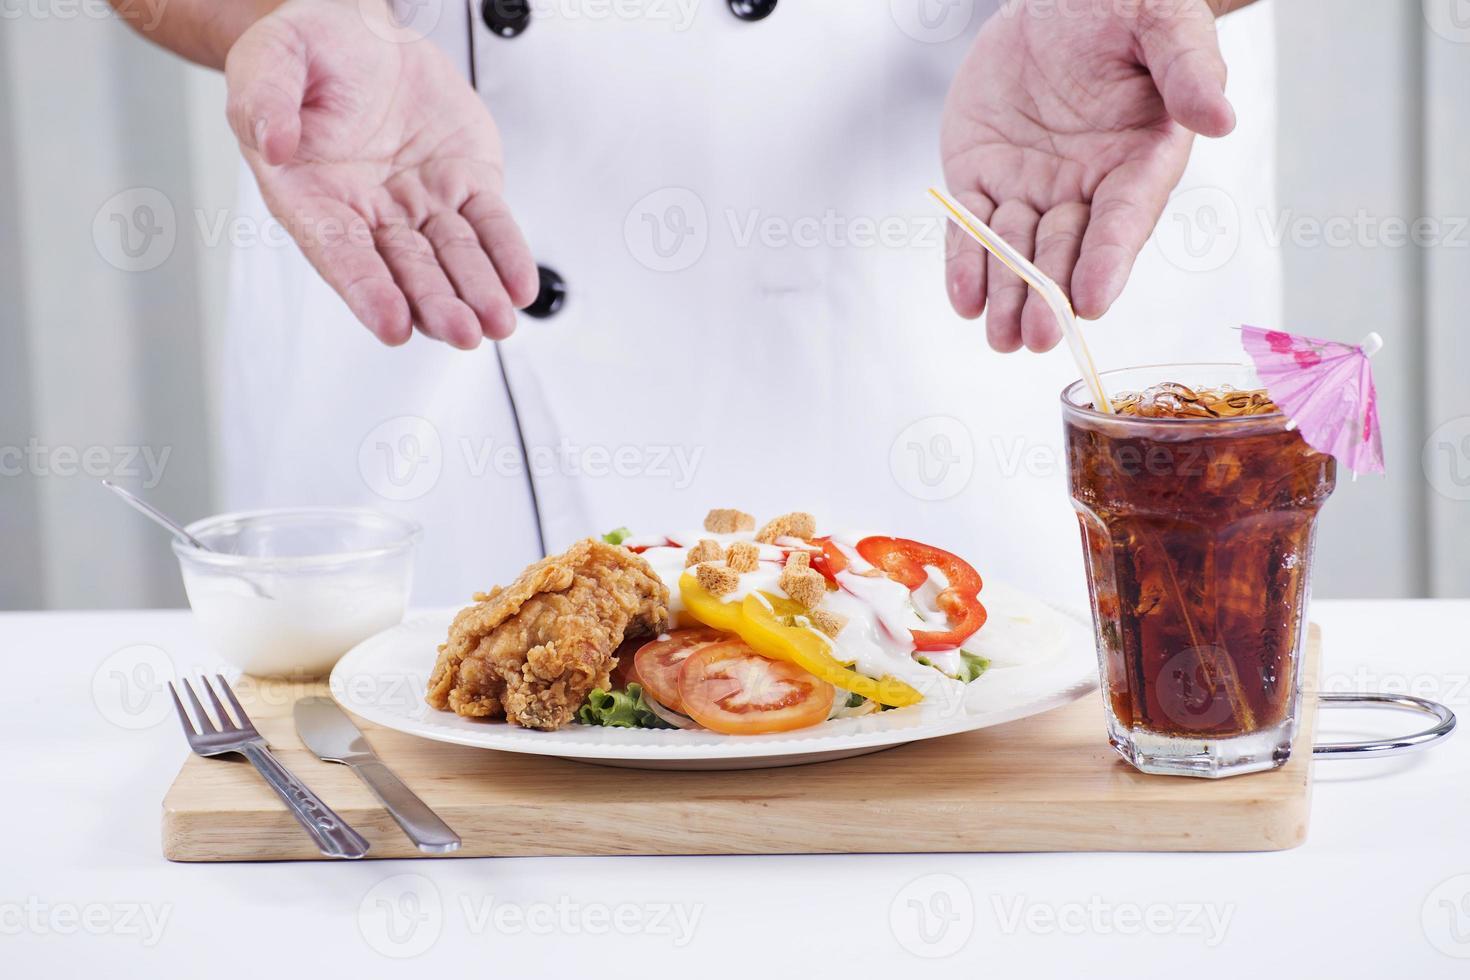 ensalada de pollo frito con cola foto